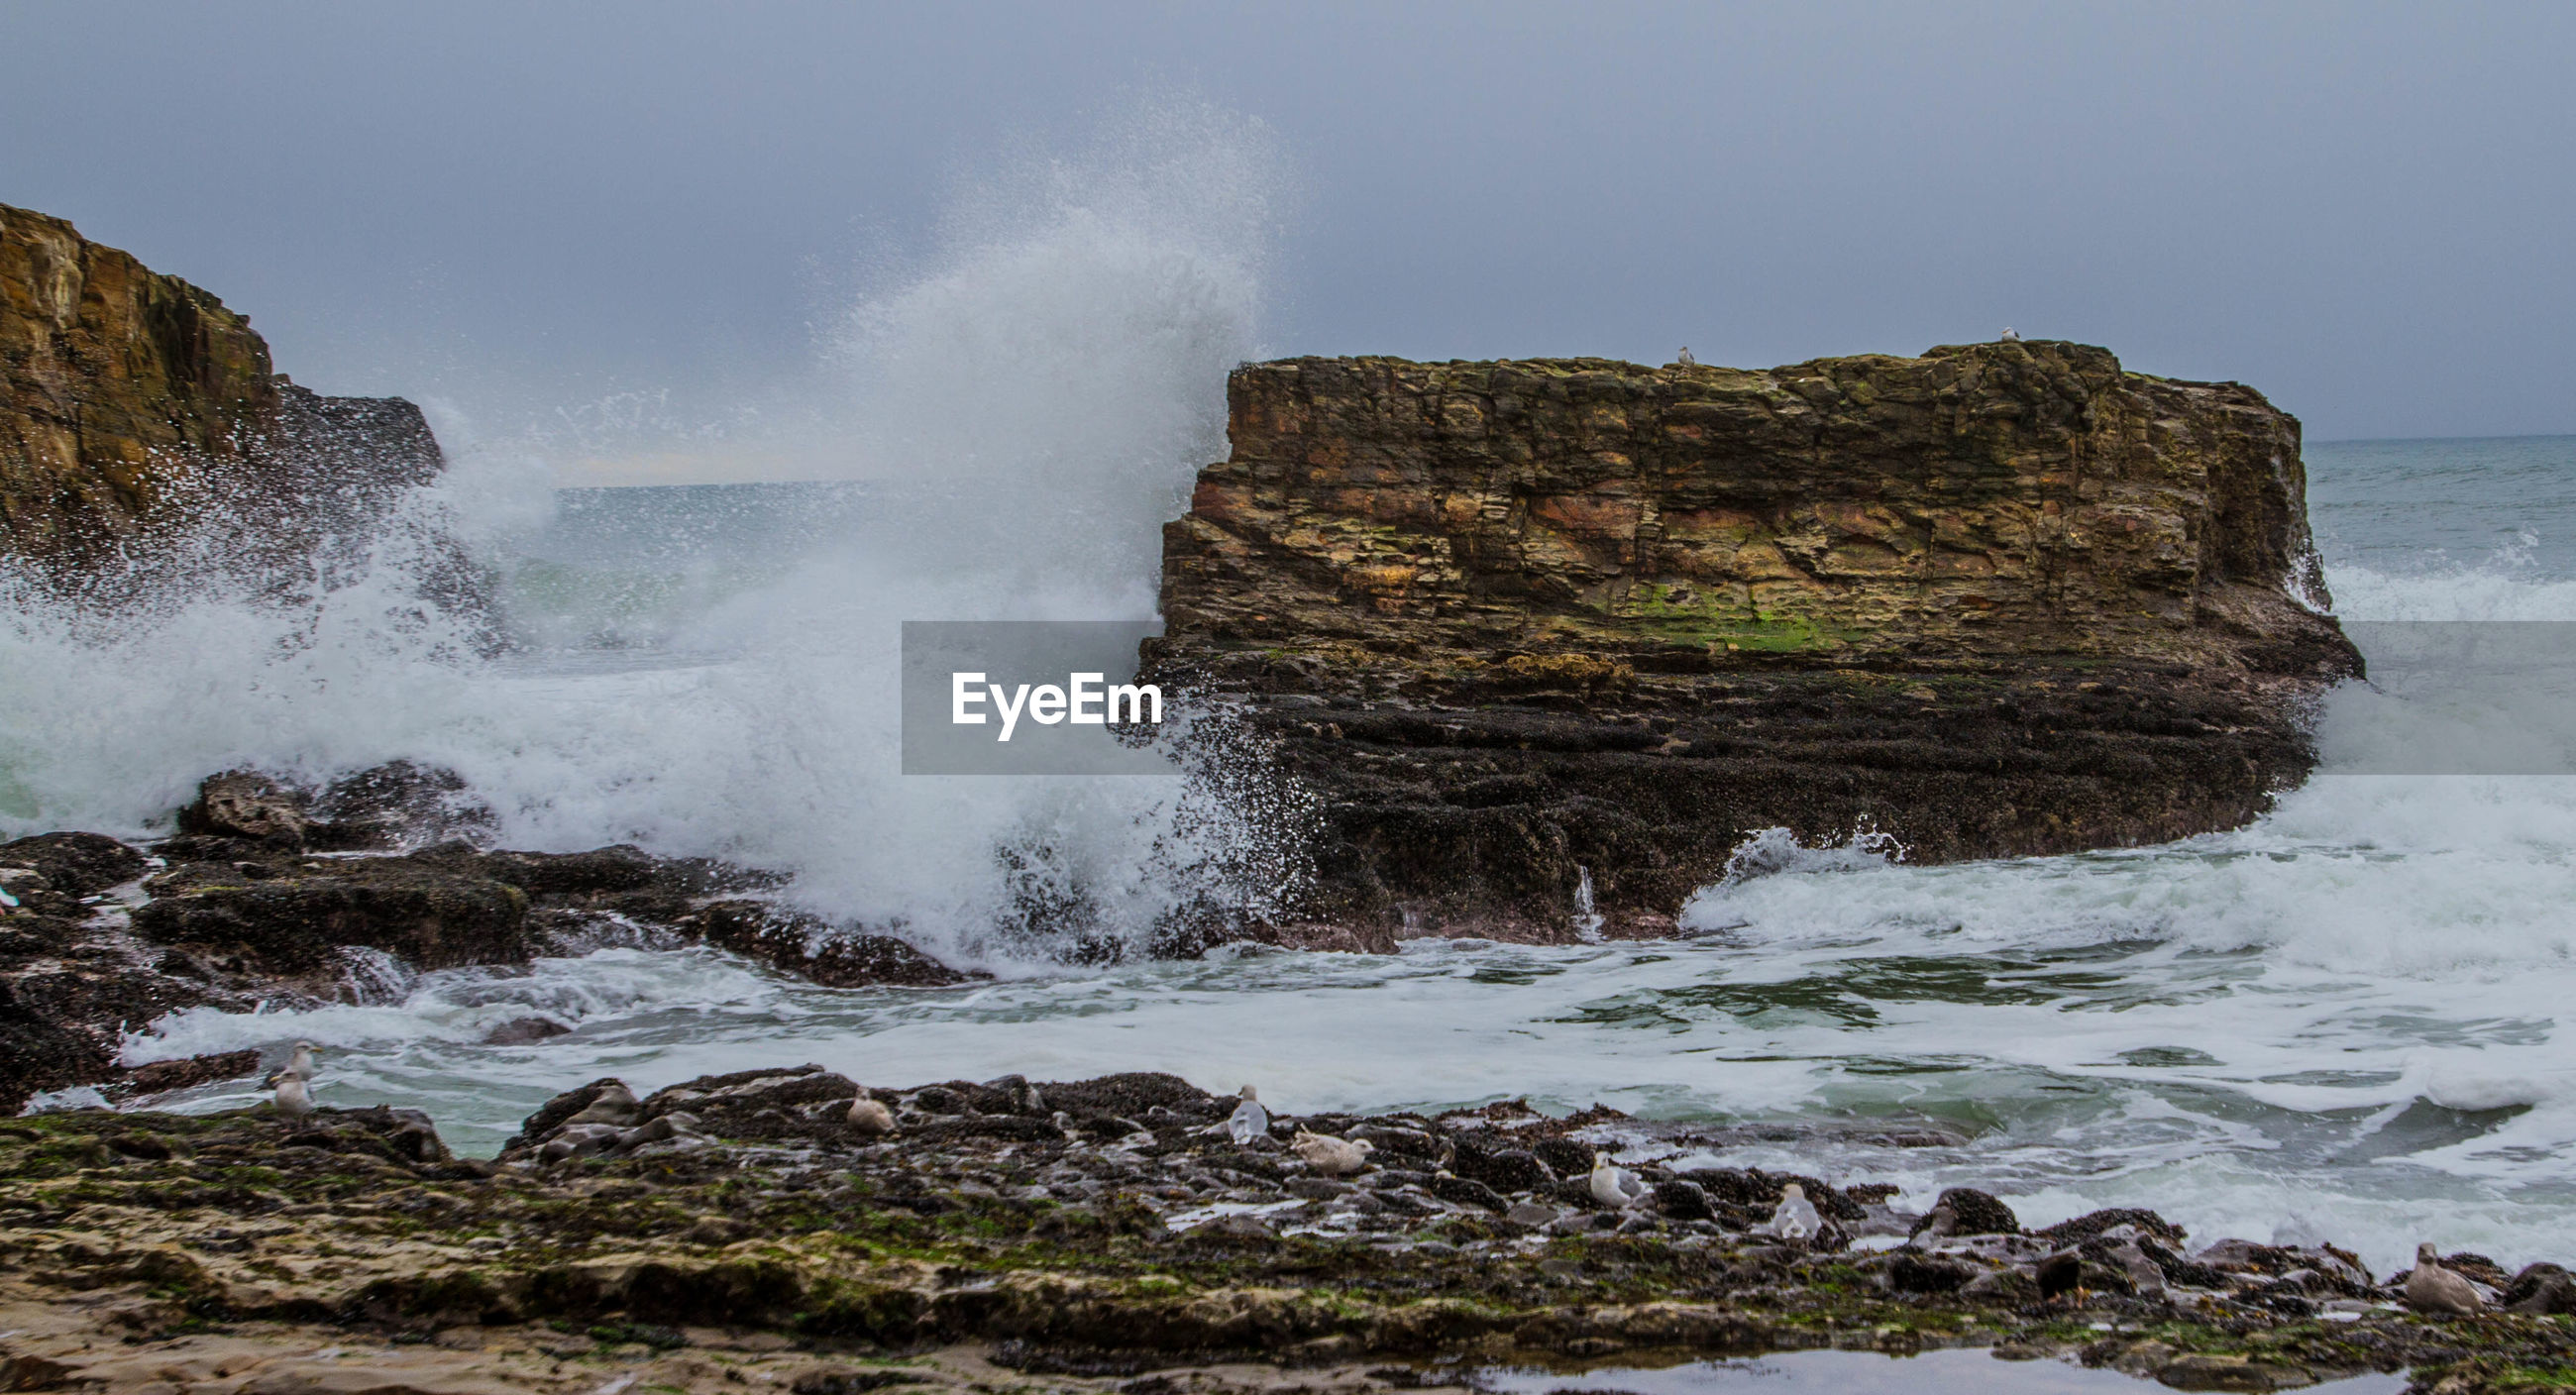 SCENIC VIEW OF WAVES BREAKING AGAINST ROCKS